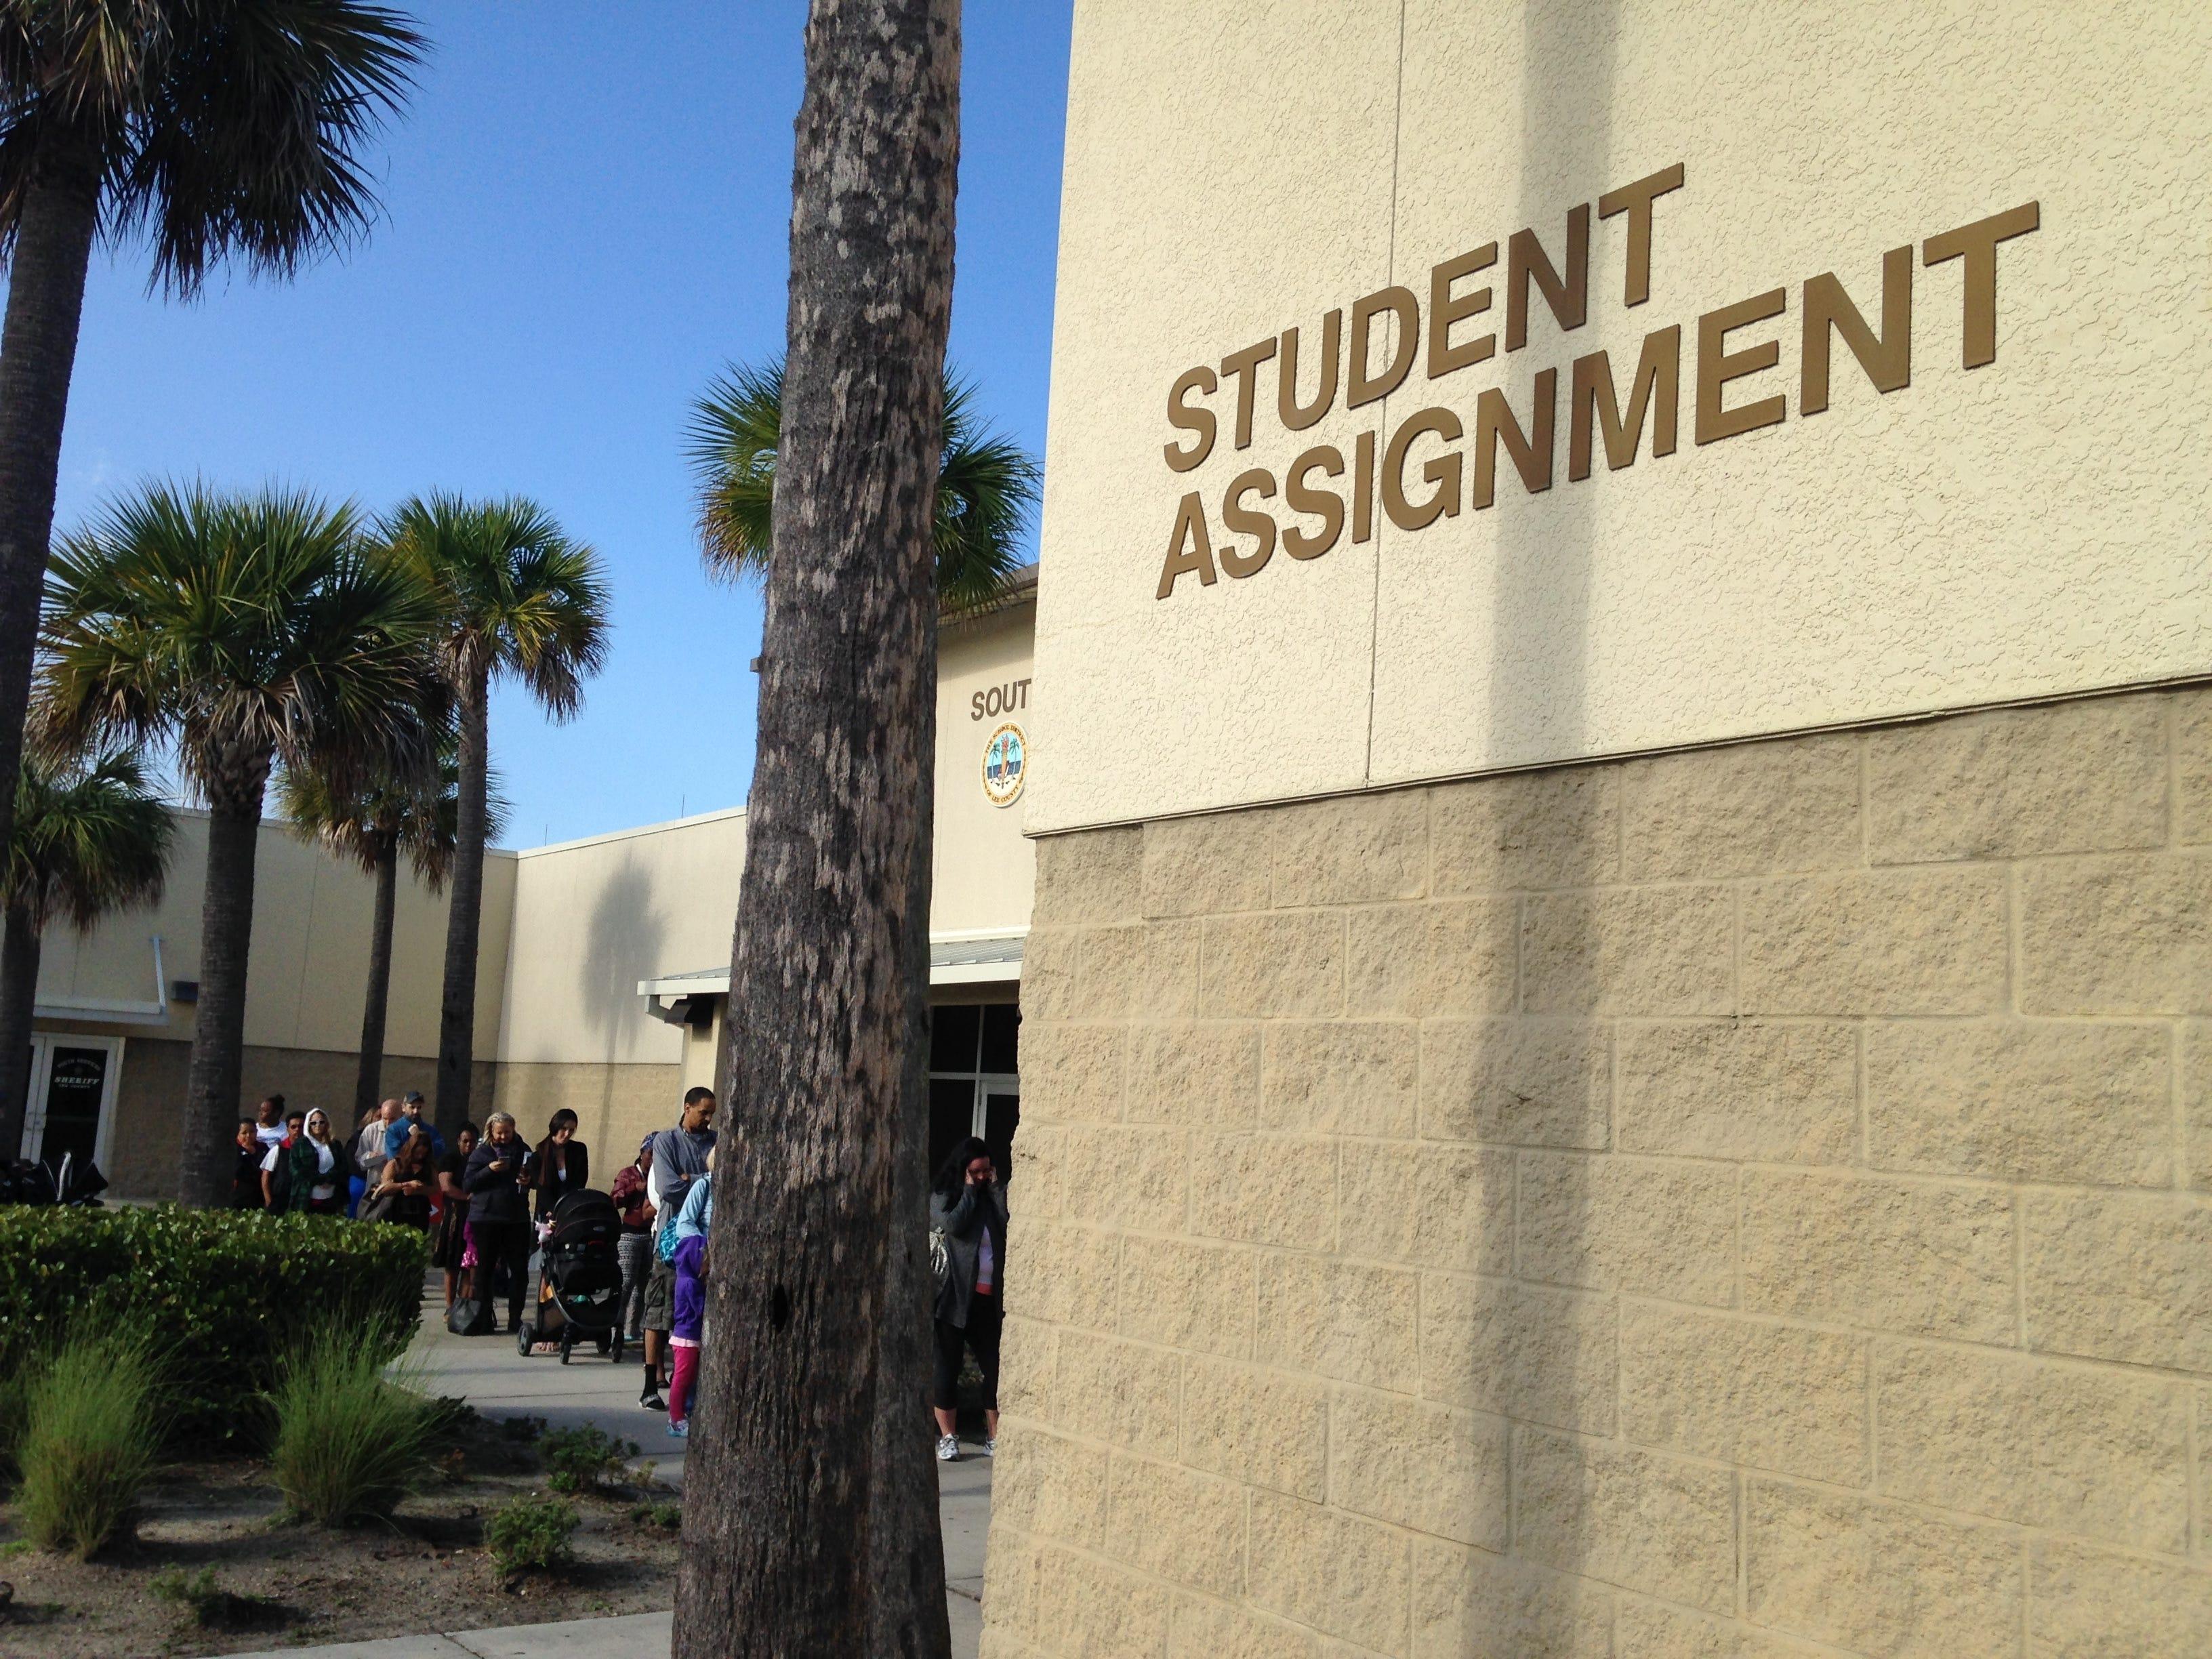 Lee County schools' open enrollment window closes at 4 p.m. Friday 3